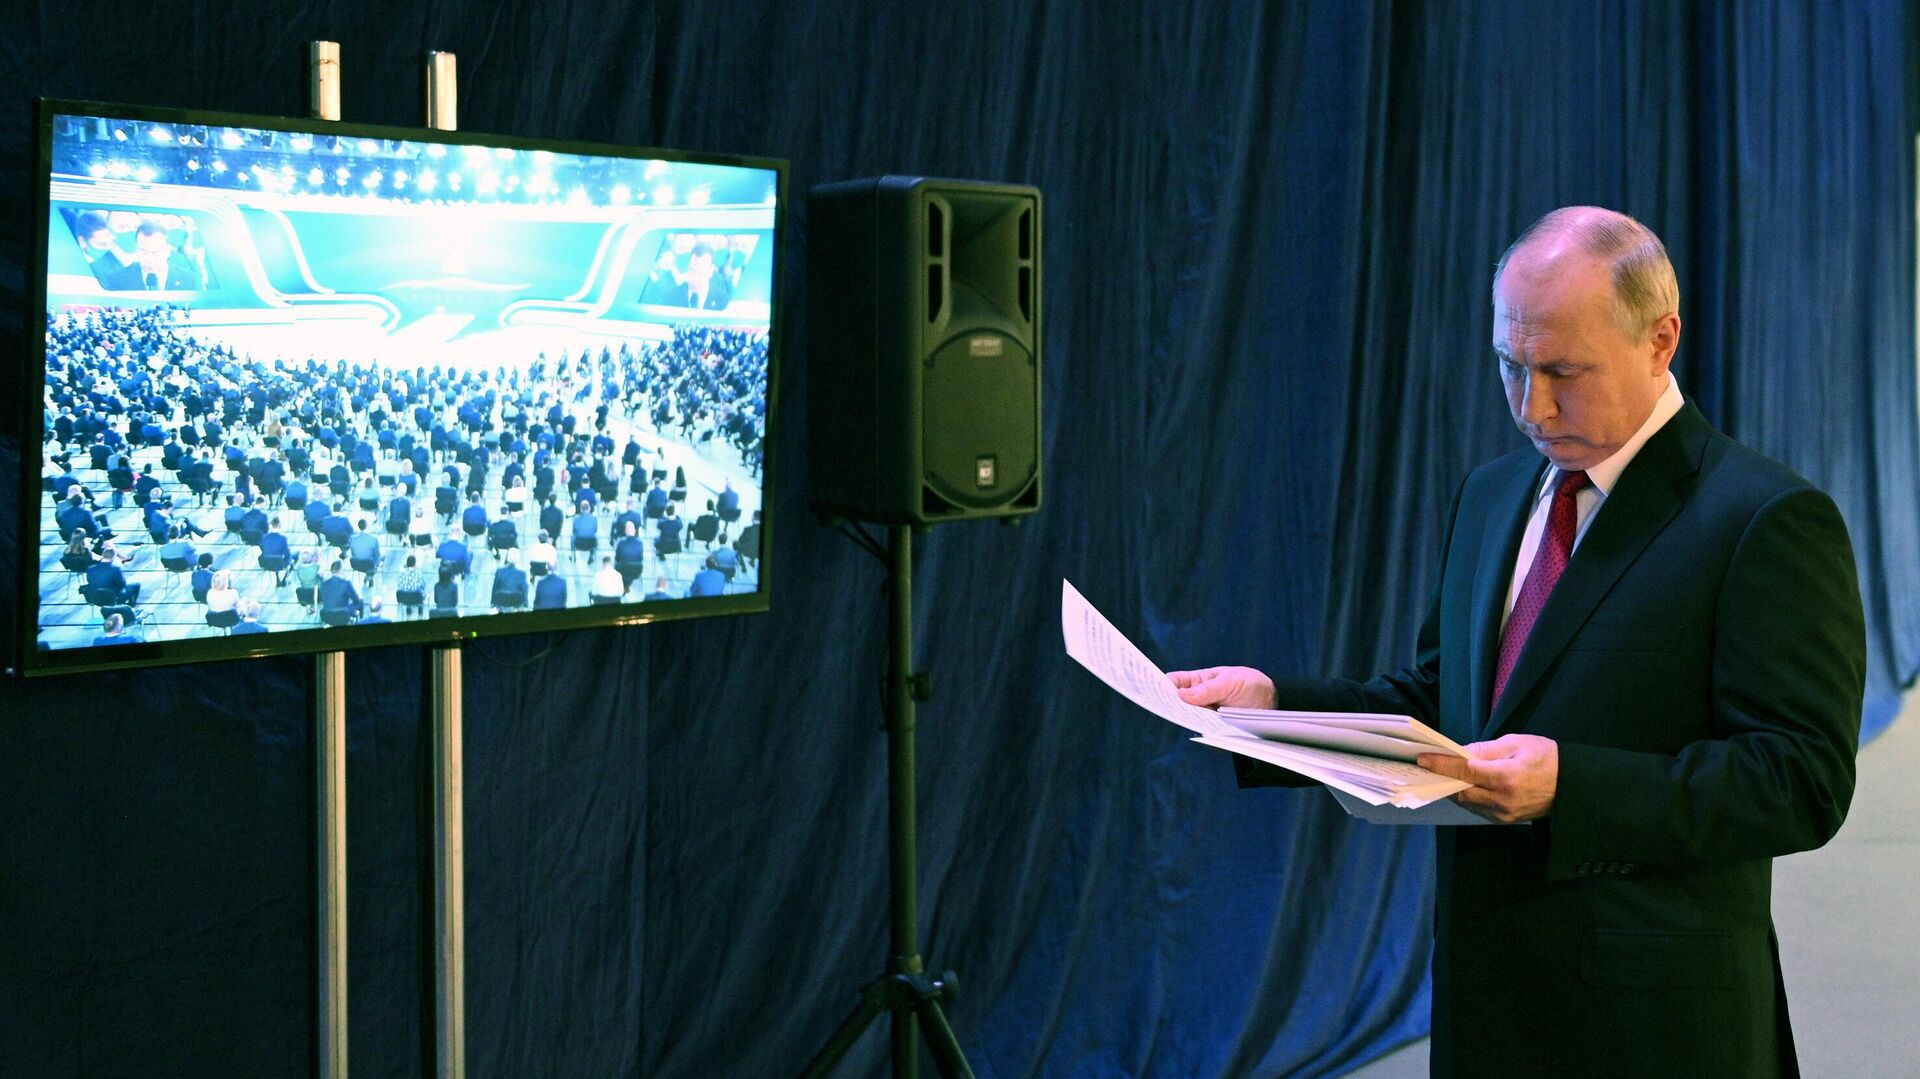 Президент РФ Владимир Путин перед началом пленарного заседания XX Съезда партии Единая Россия - РИА Новости, 1920, 19.06.2021